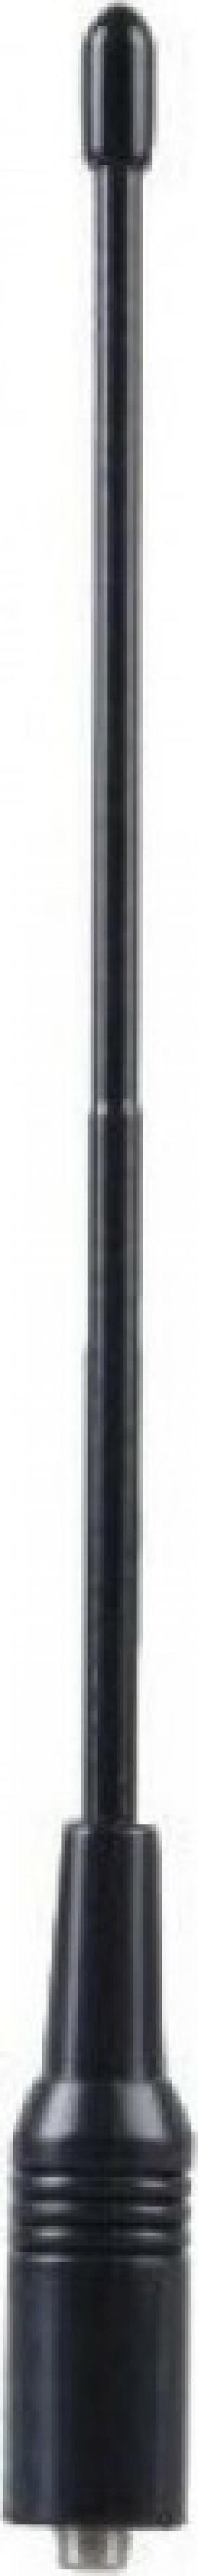 Diamond Antenna RH-701 Κεραία Πομποδέκτη Universal Male 21cm